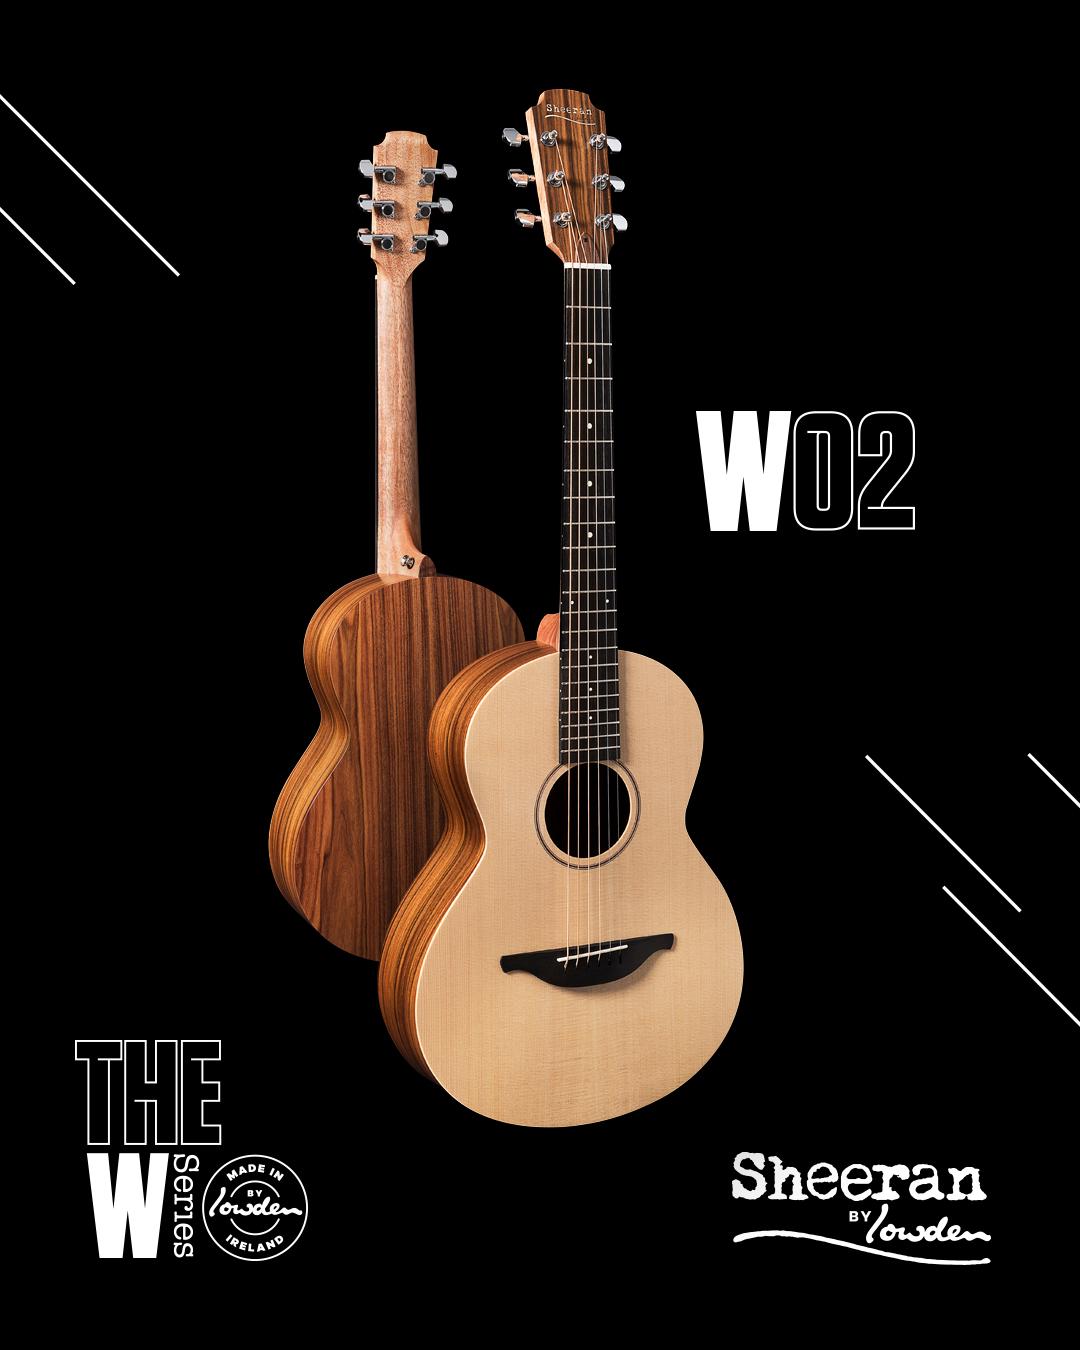 Sheeran W02 PRE ORDER